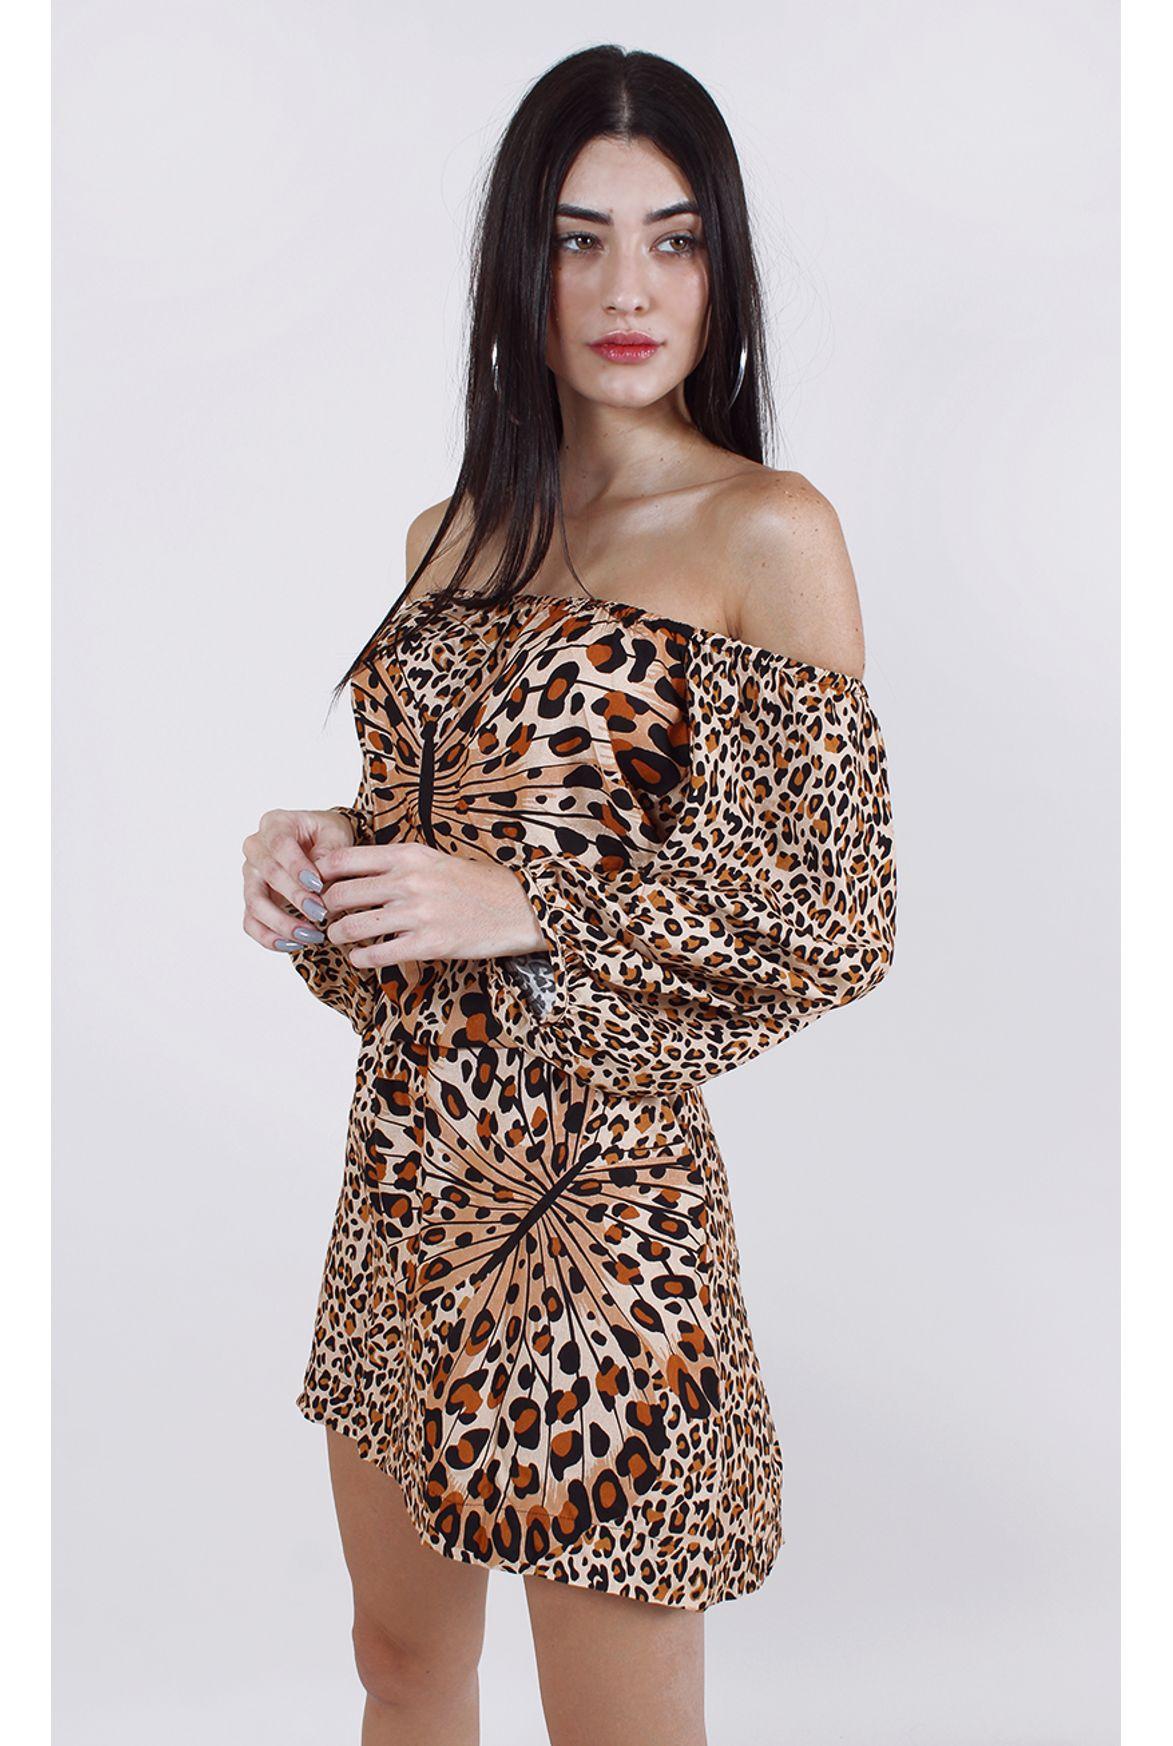 Fshn Vestido Farm Curto Borboleta Marrom Fashion Closet